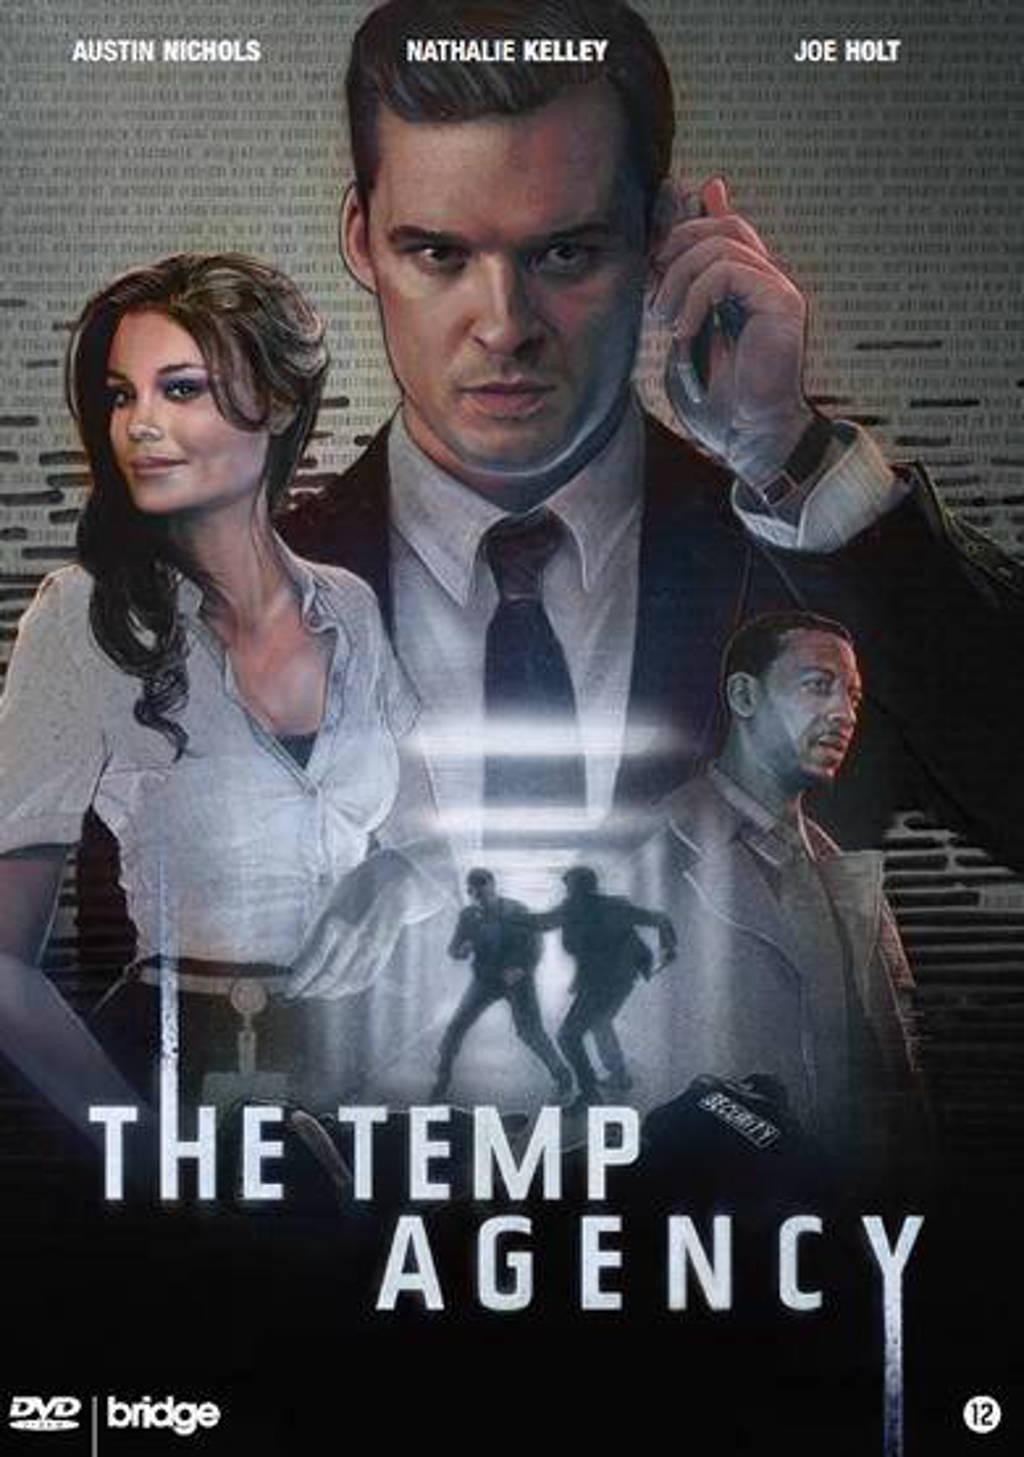 Temp agency (DVD)